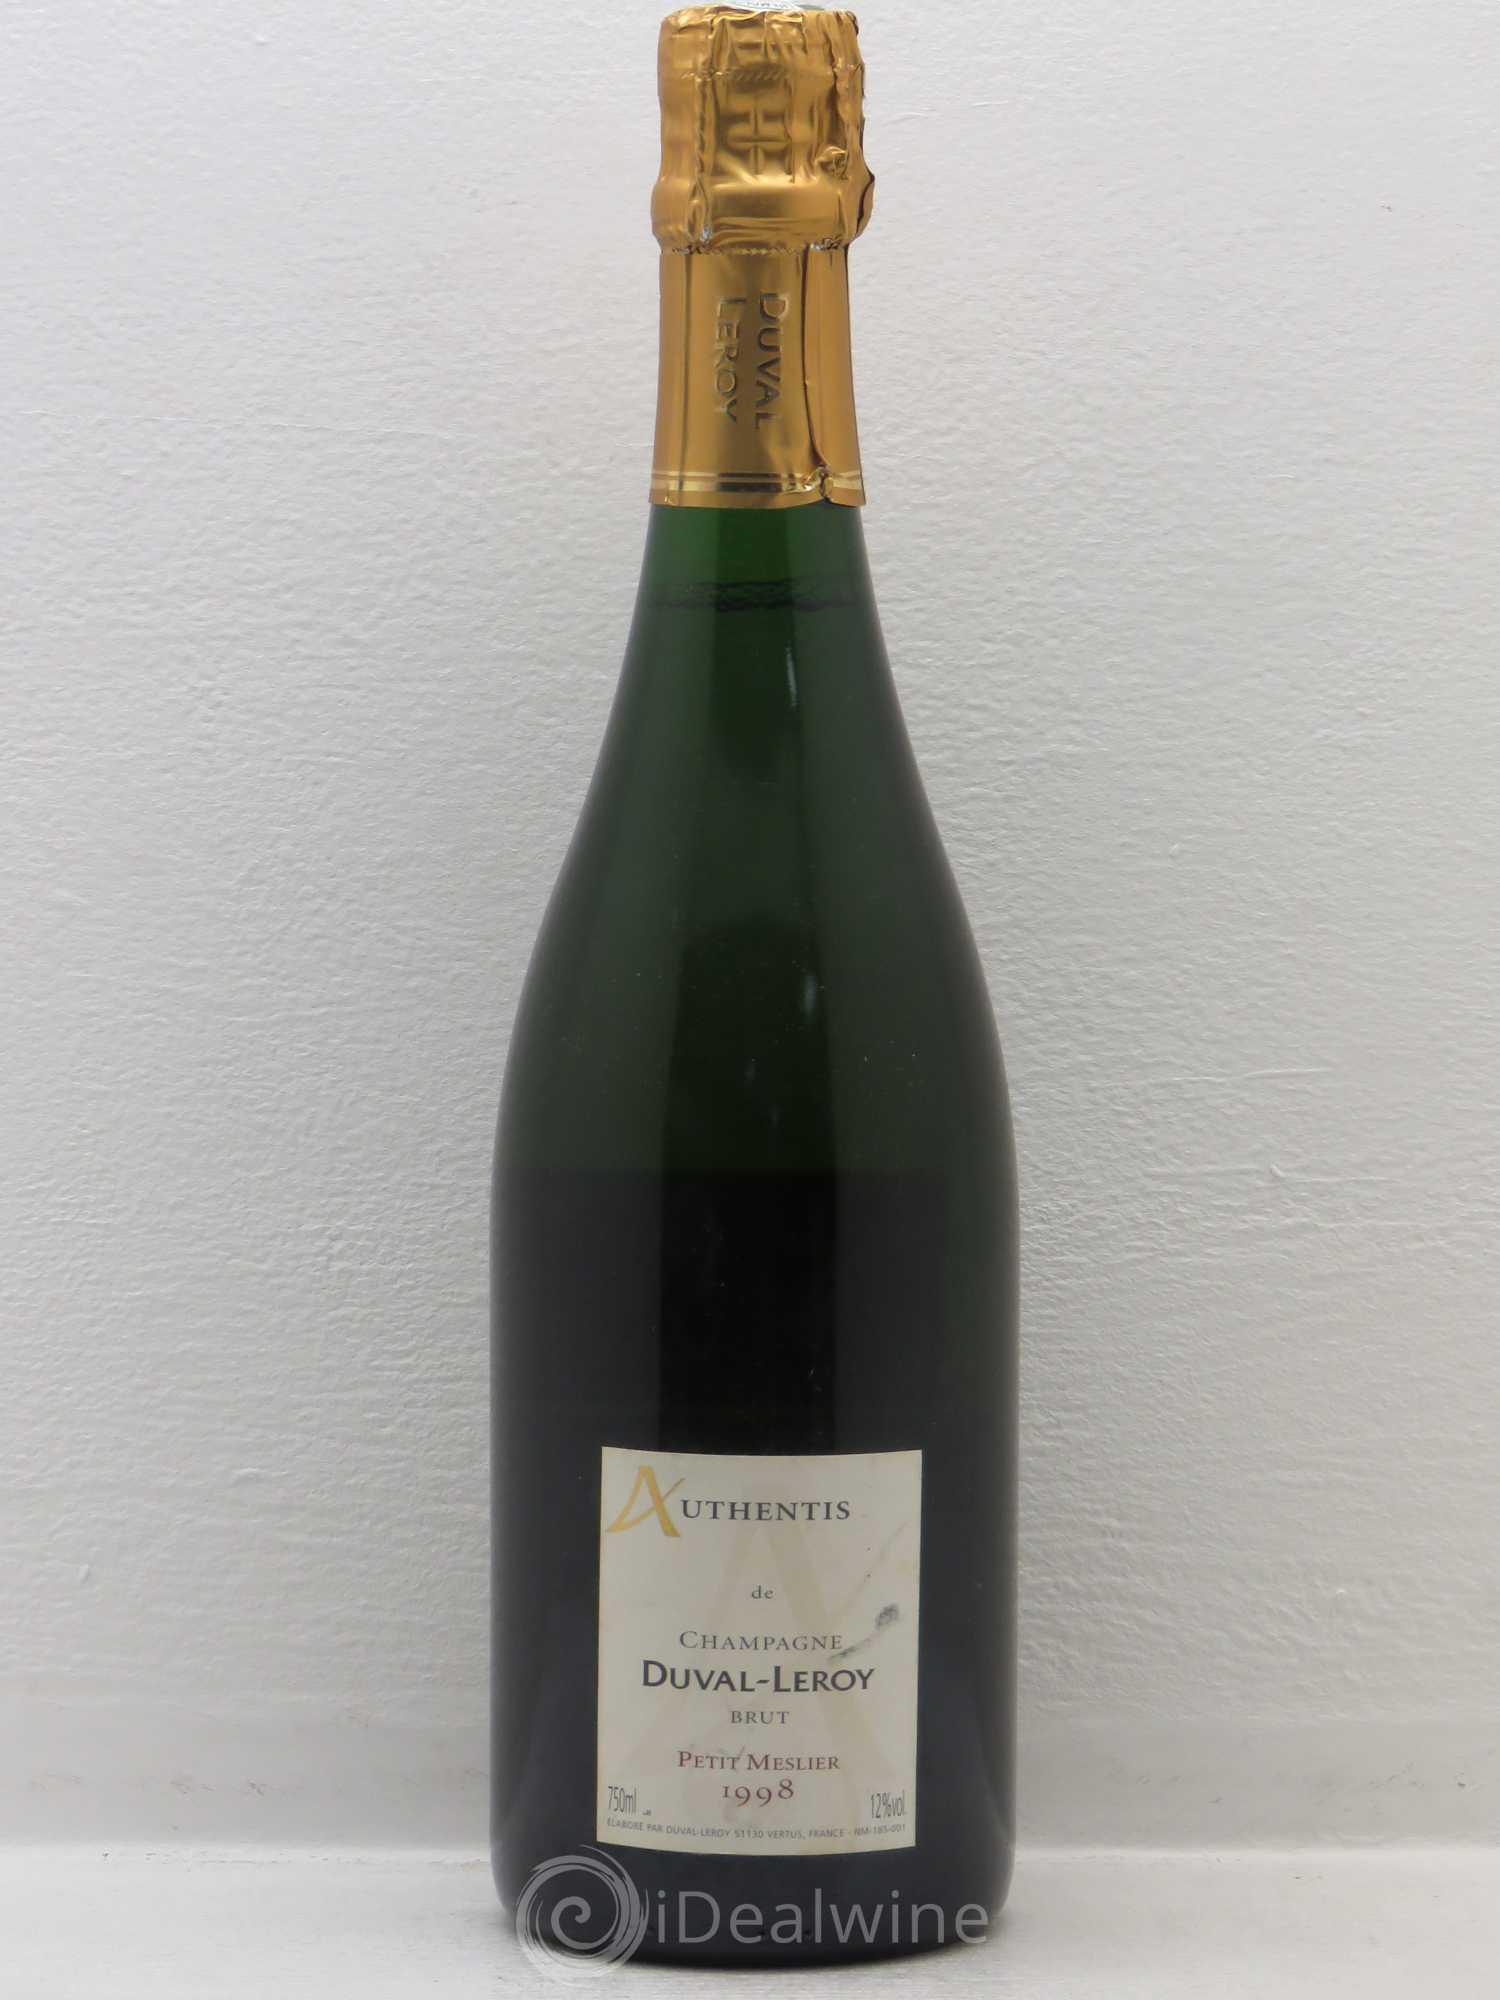 acheter brut champagne duval leroy petit meslier authentis 1998 lot 1771. Black Bedroom Furniture Sets. Home Design Ideas